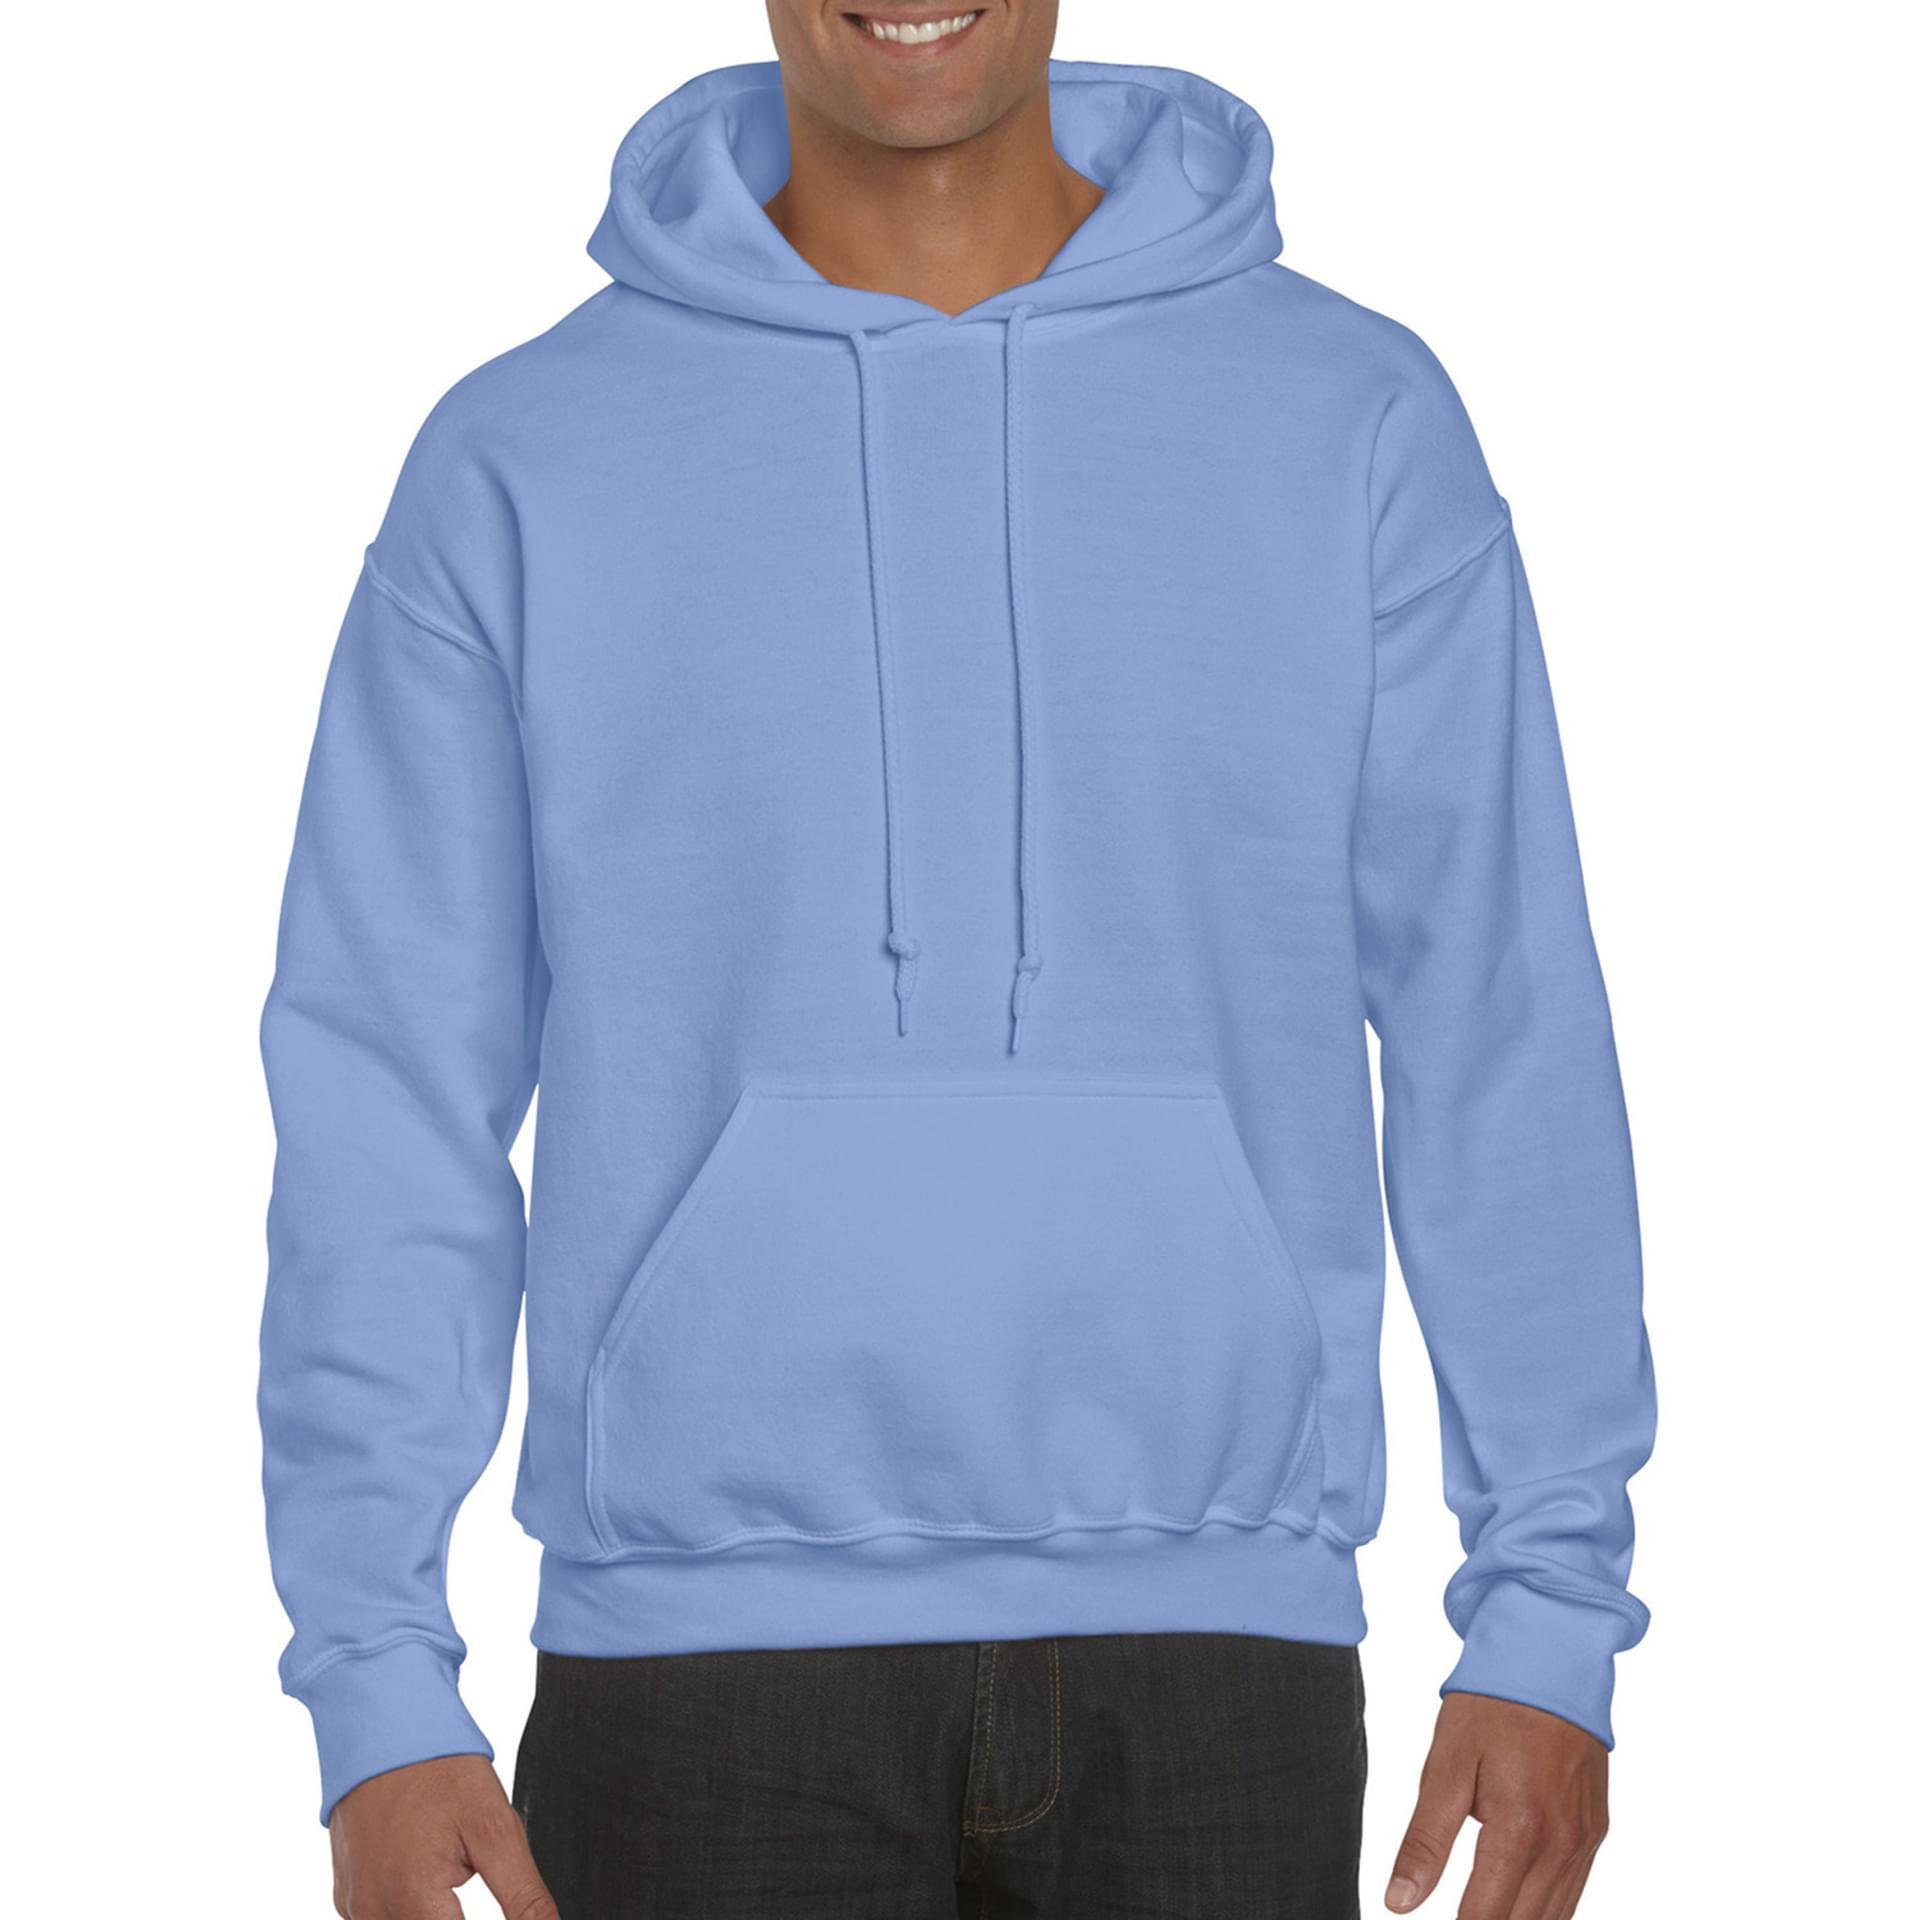 9683df1a4ef1 ... DryBlend® Adult hooded sweatshirt gildan carolina blue. Couleur  carolina blue